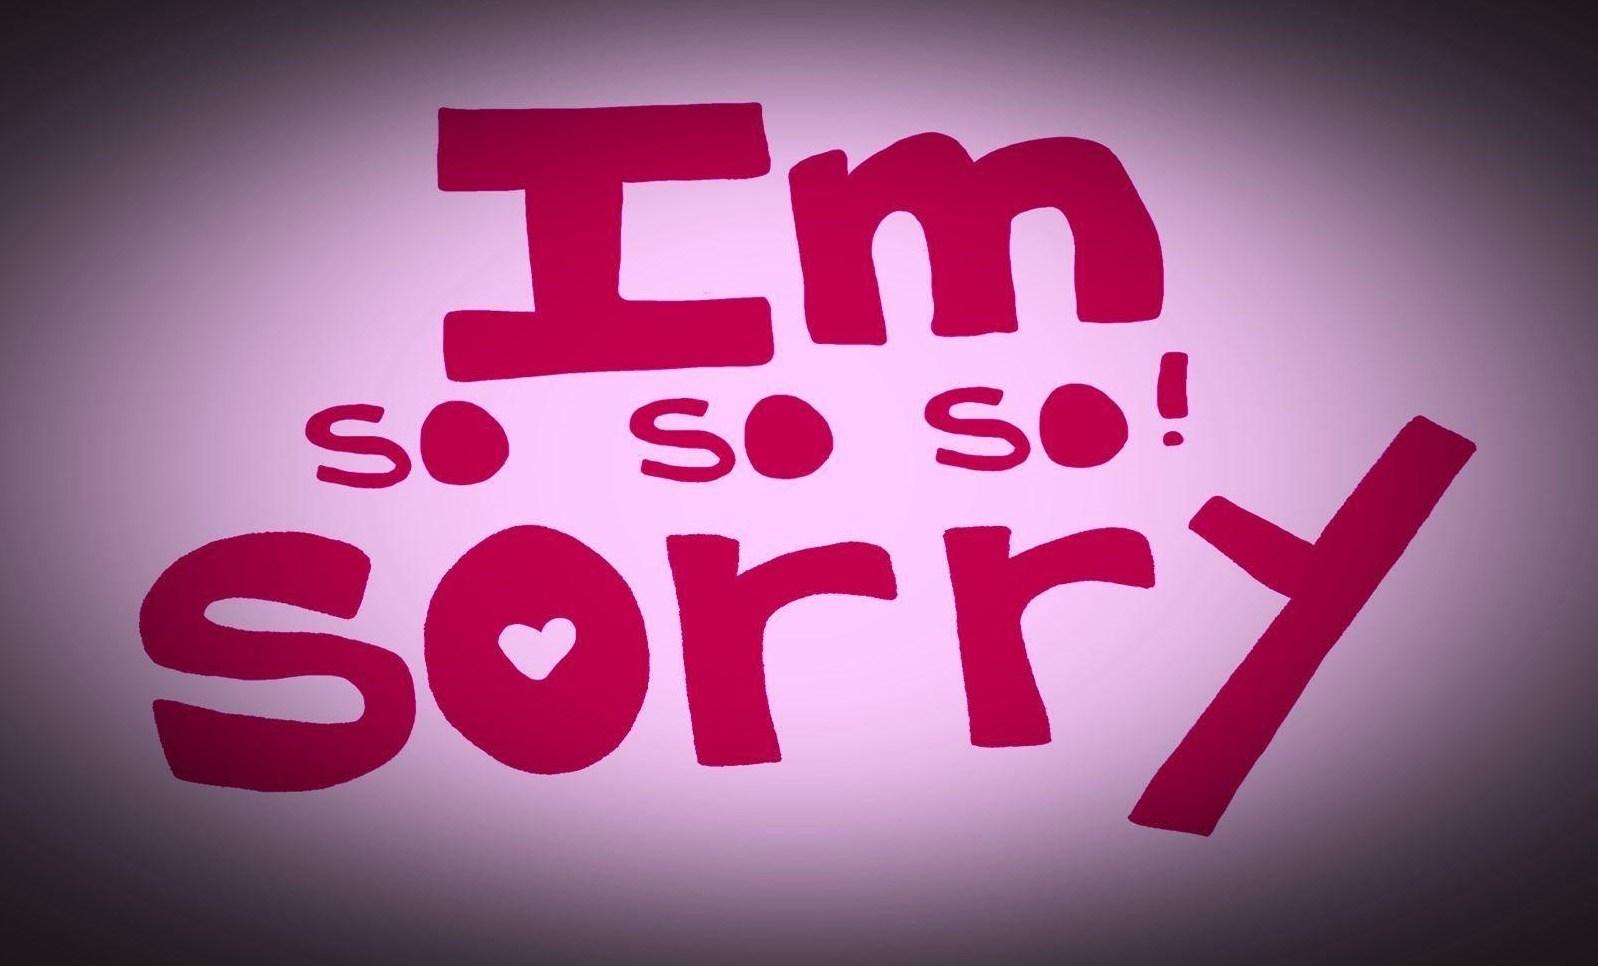 بالصور كلام اعتذار للحبيب , صور عليها عبارات اعتذار 74 10